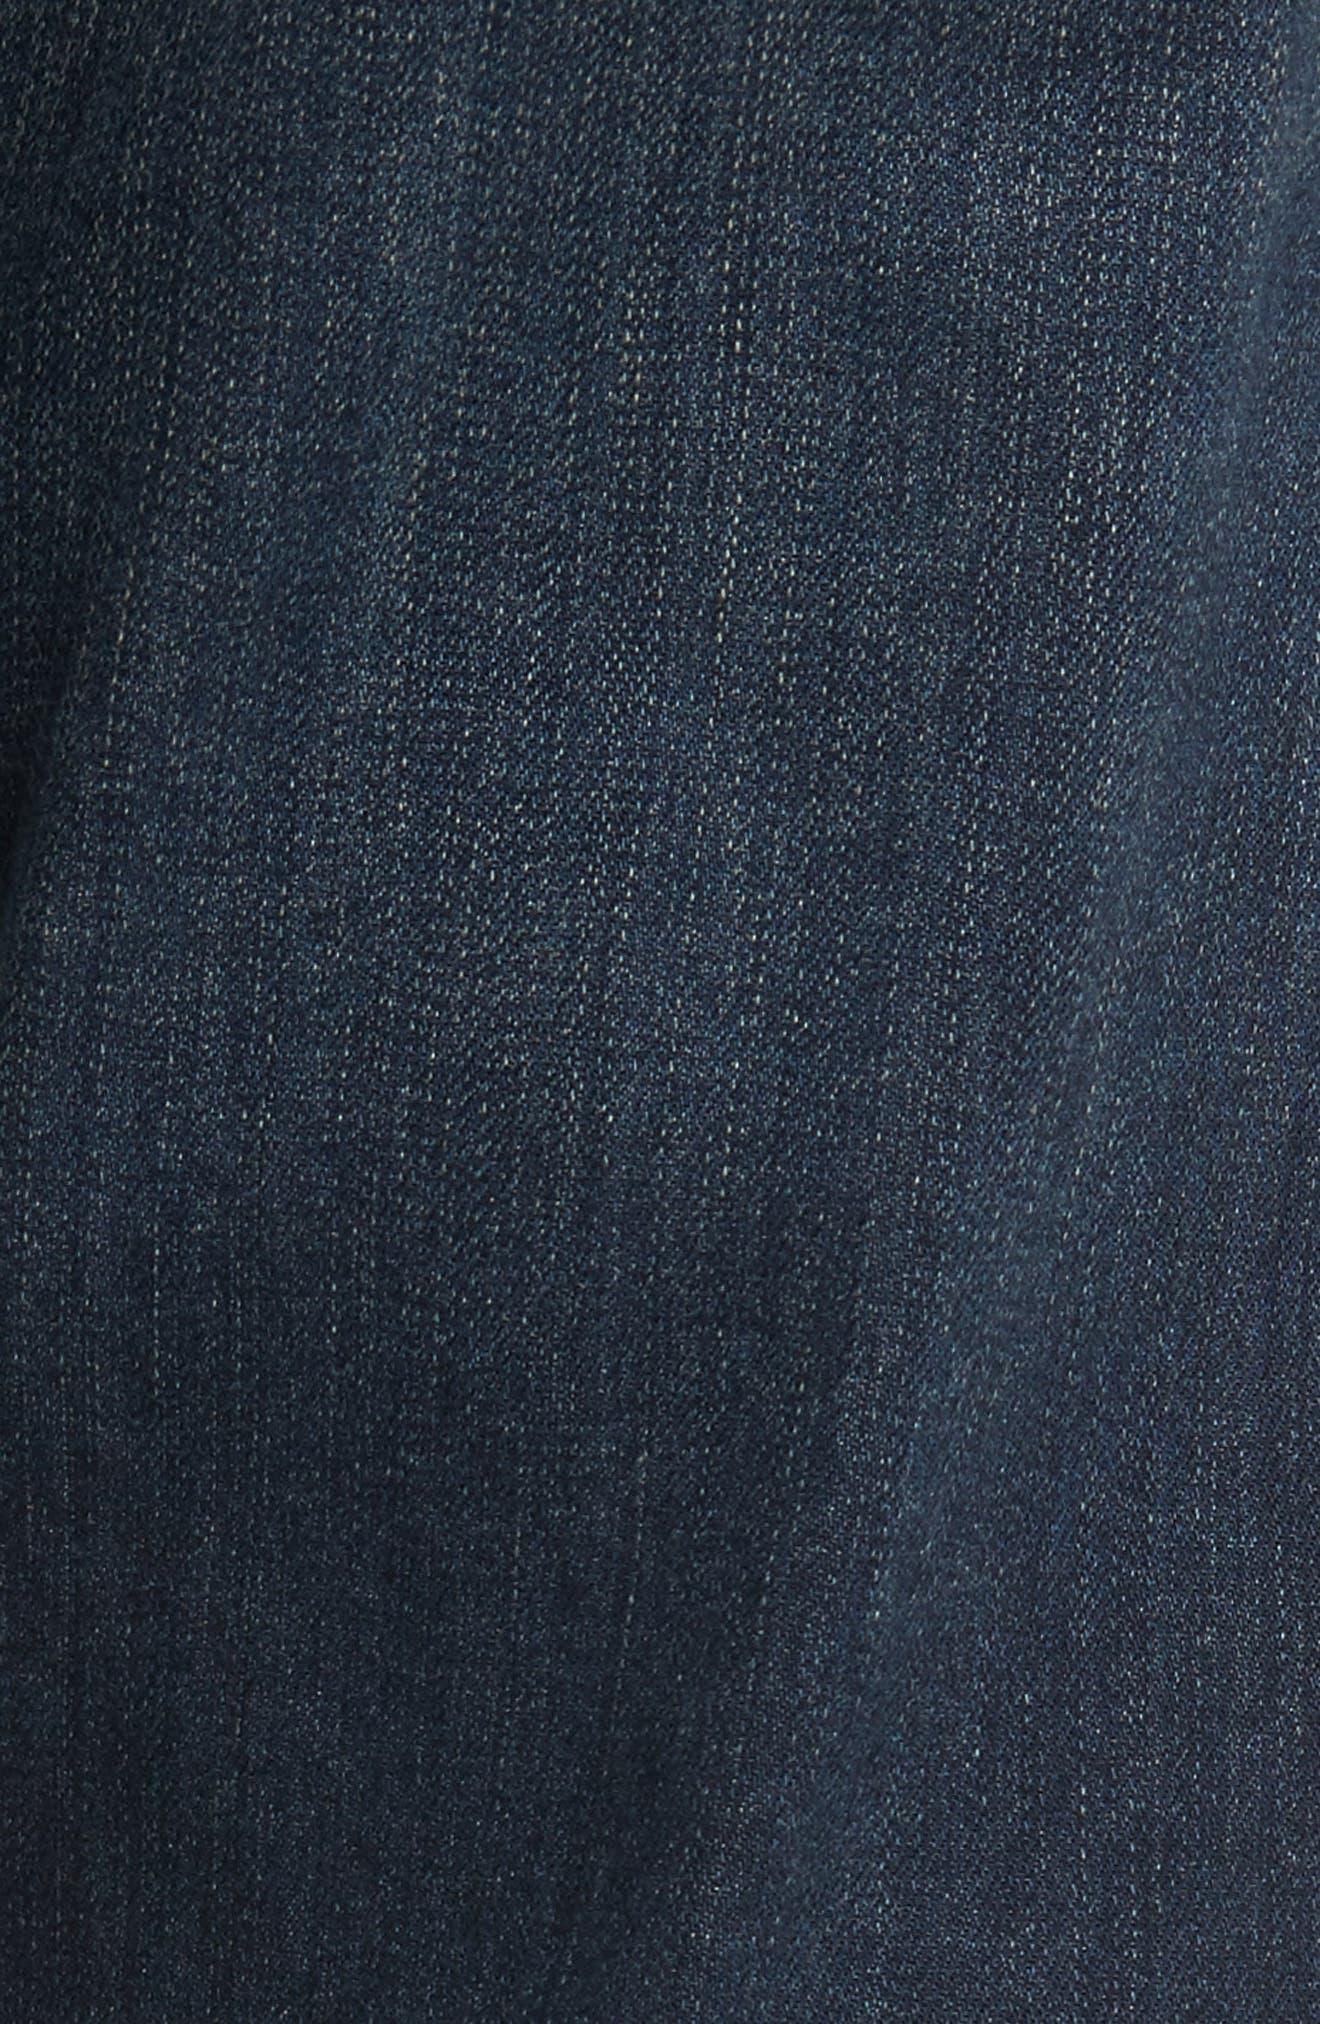 PERFORM - Bowery Slim Fit Jeans,                             Alternate thumbnail 5, color,                             Kingman